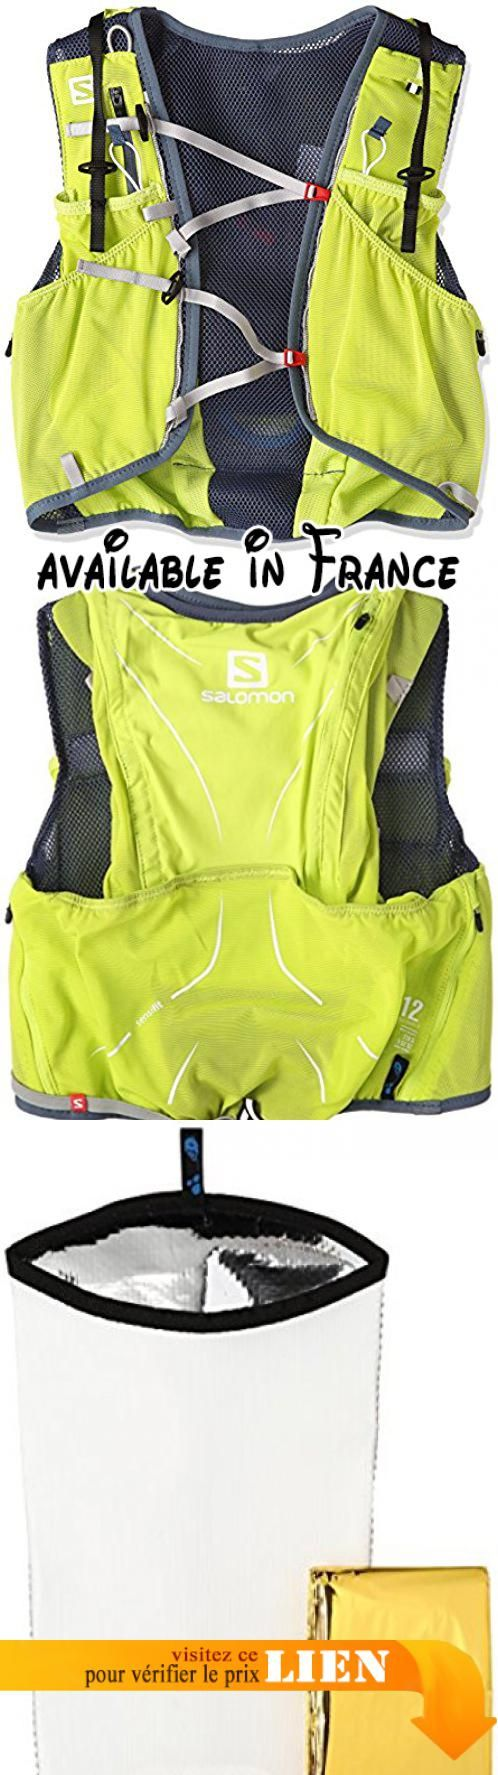 B01N2GGJIV : Sac à dos Advanced Skin 12 NH - mixte. mochila trail running carreras montaña